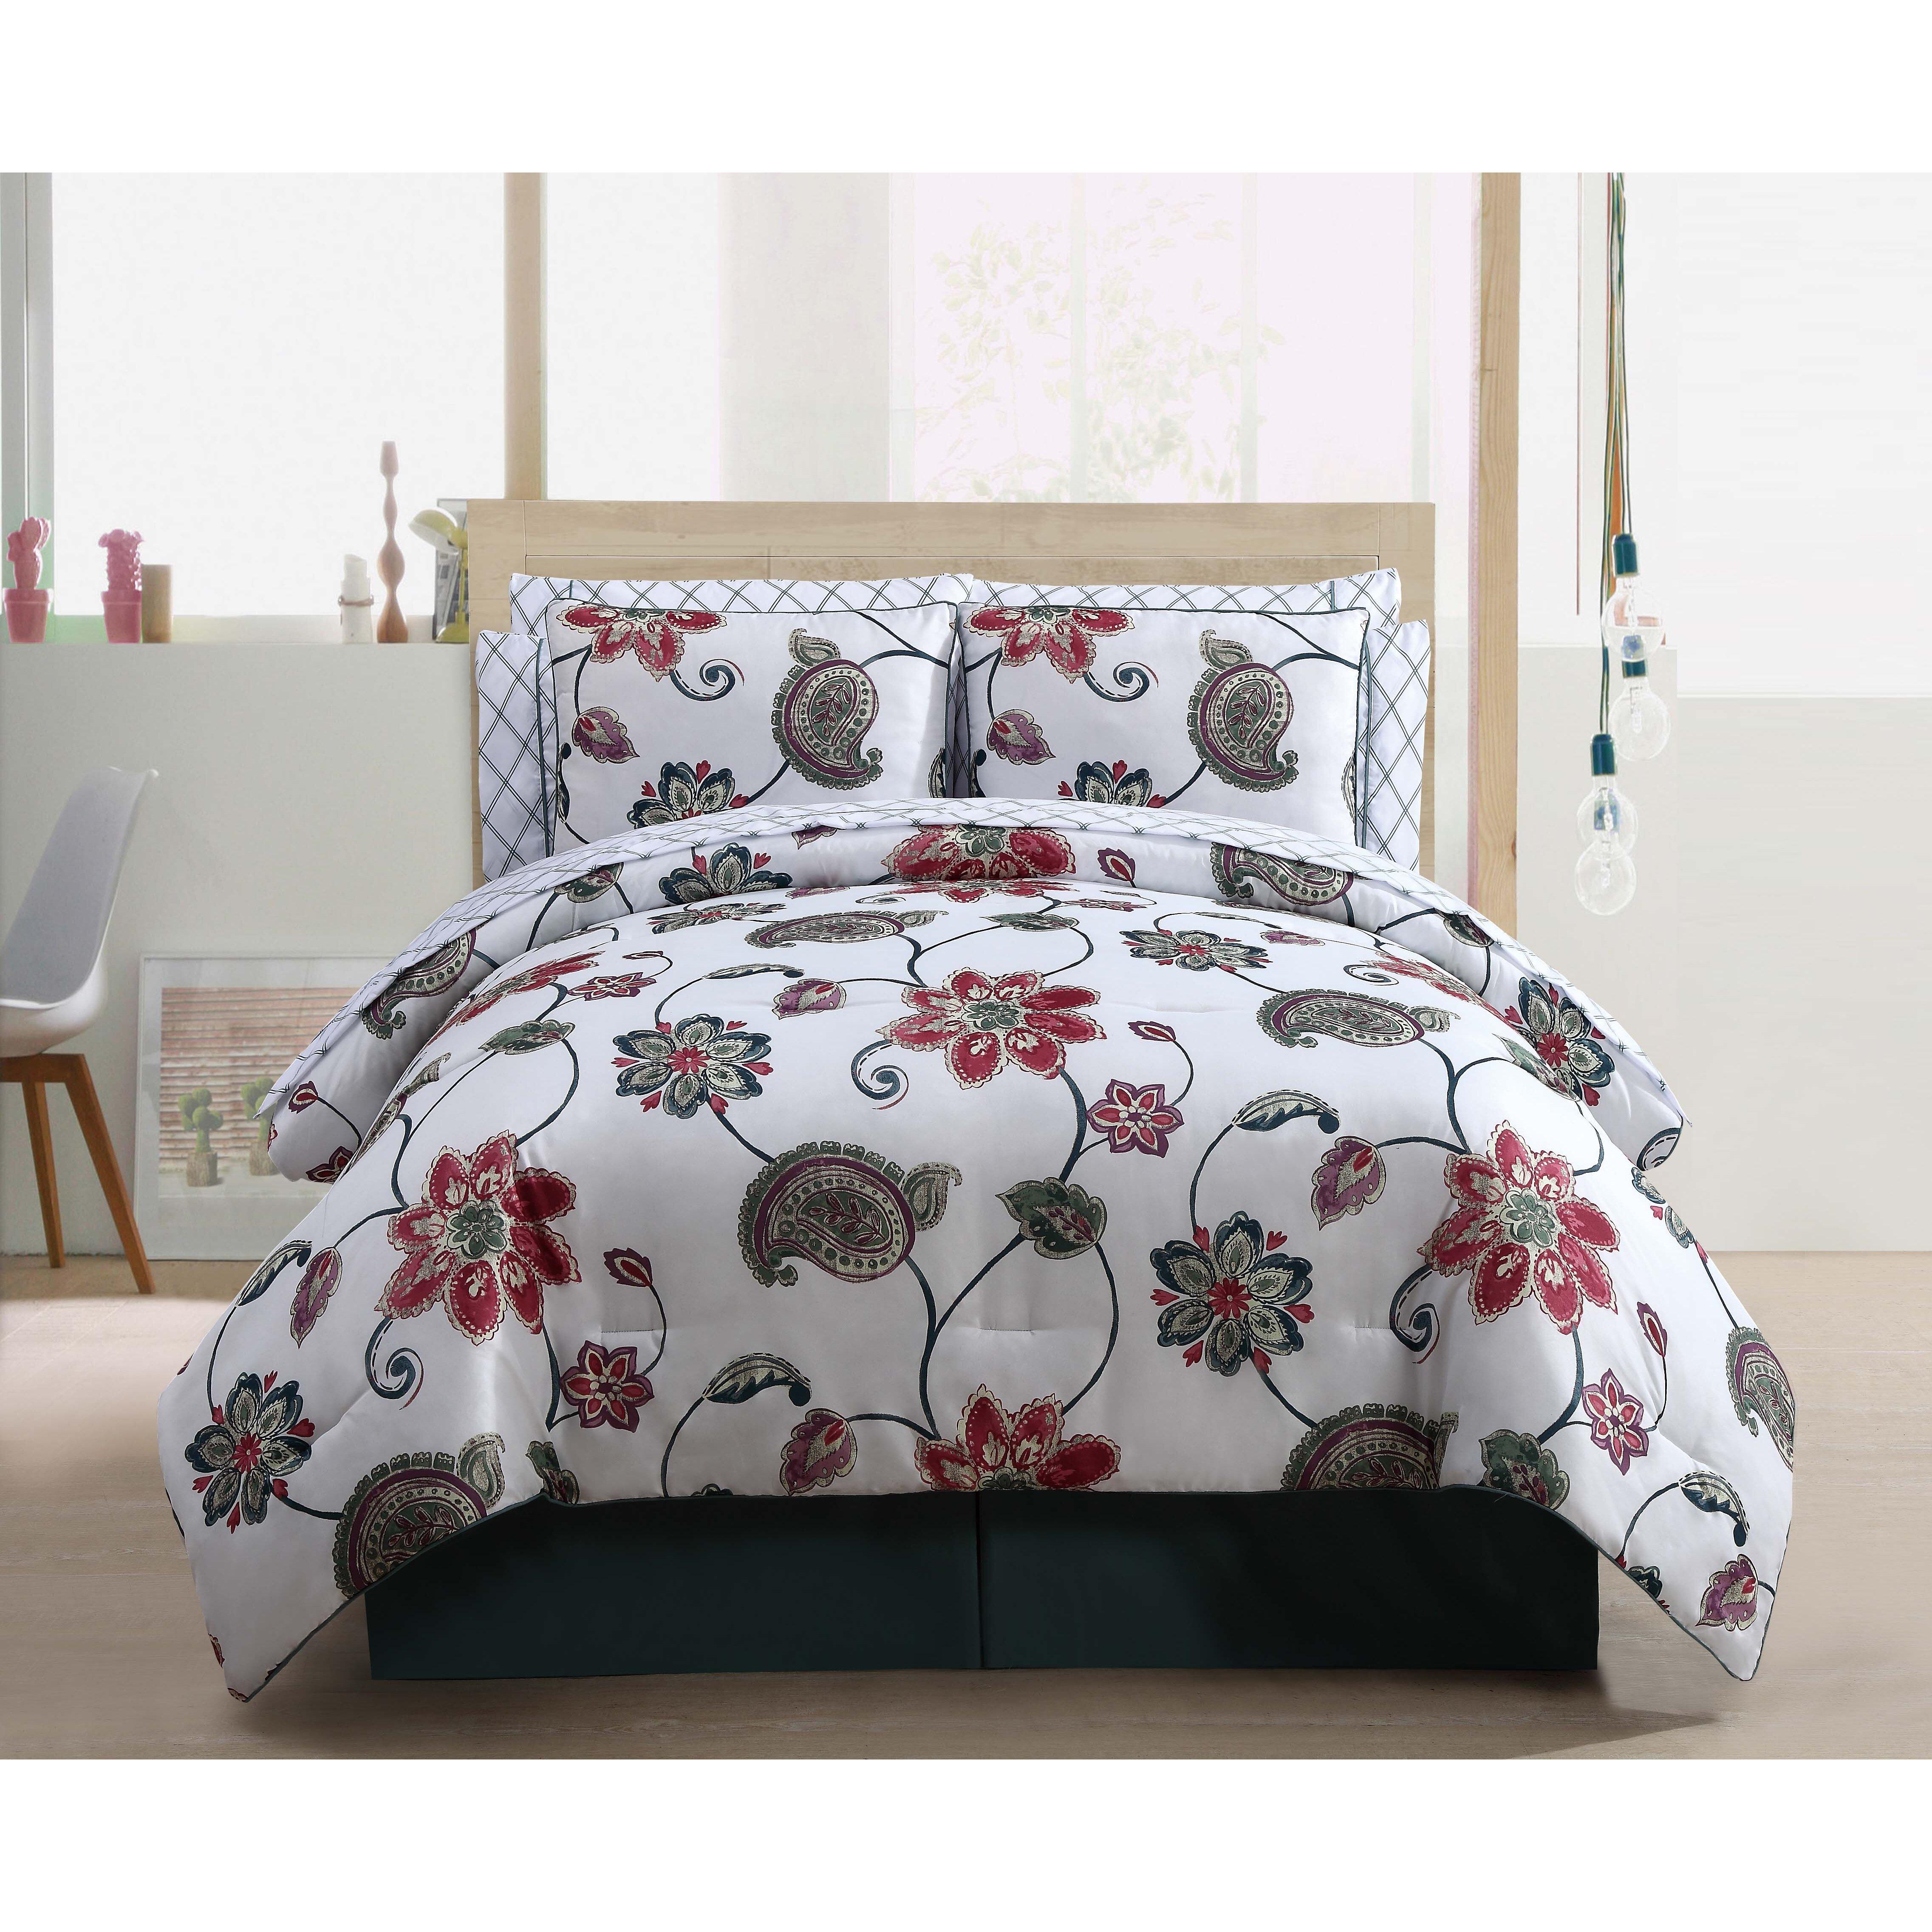 Ariana Piece Reversible Comforter